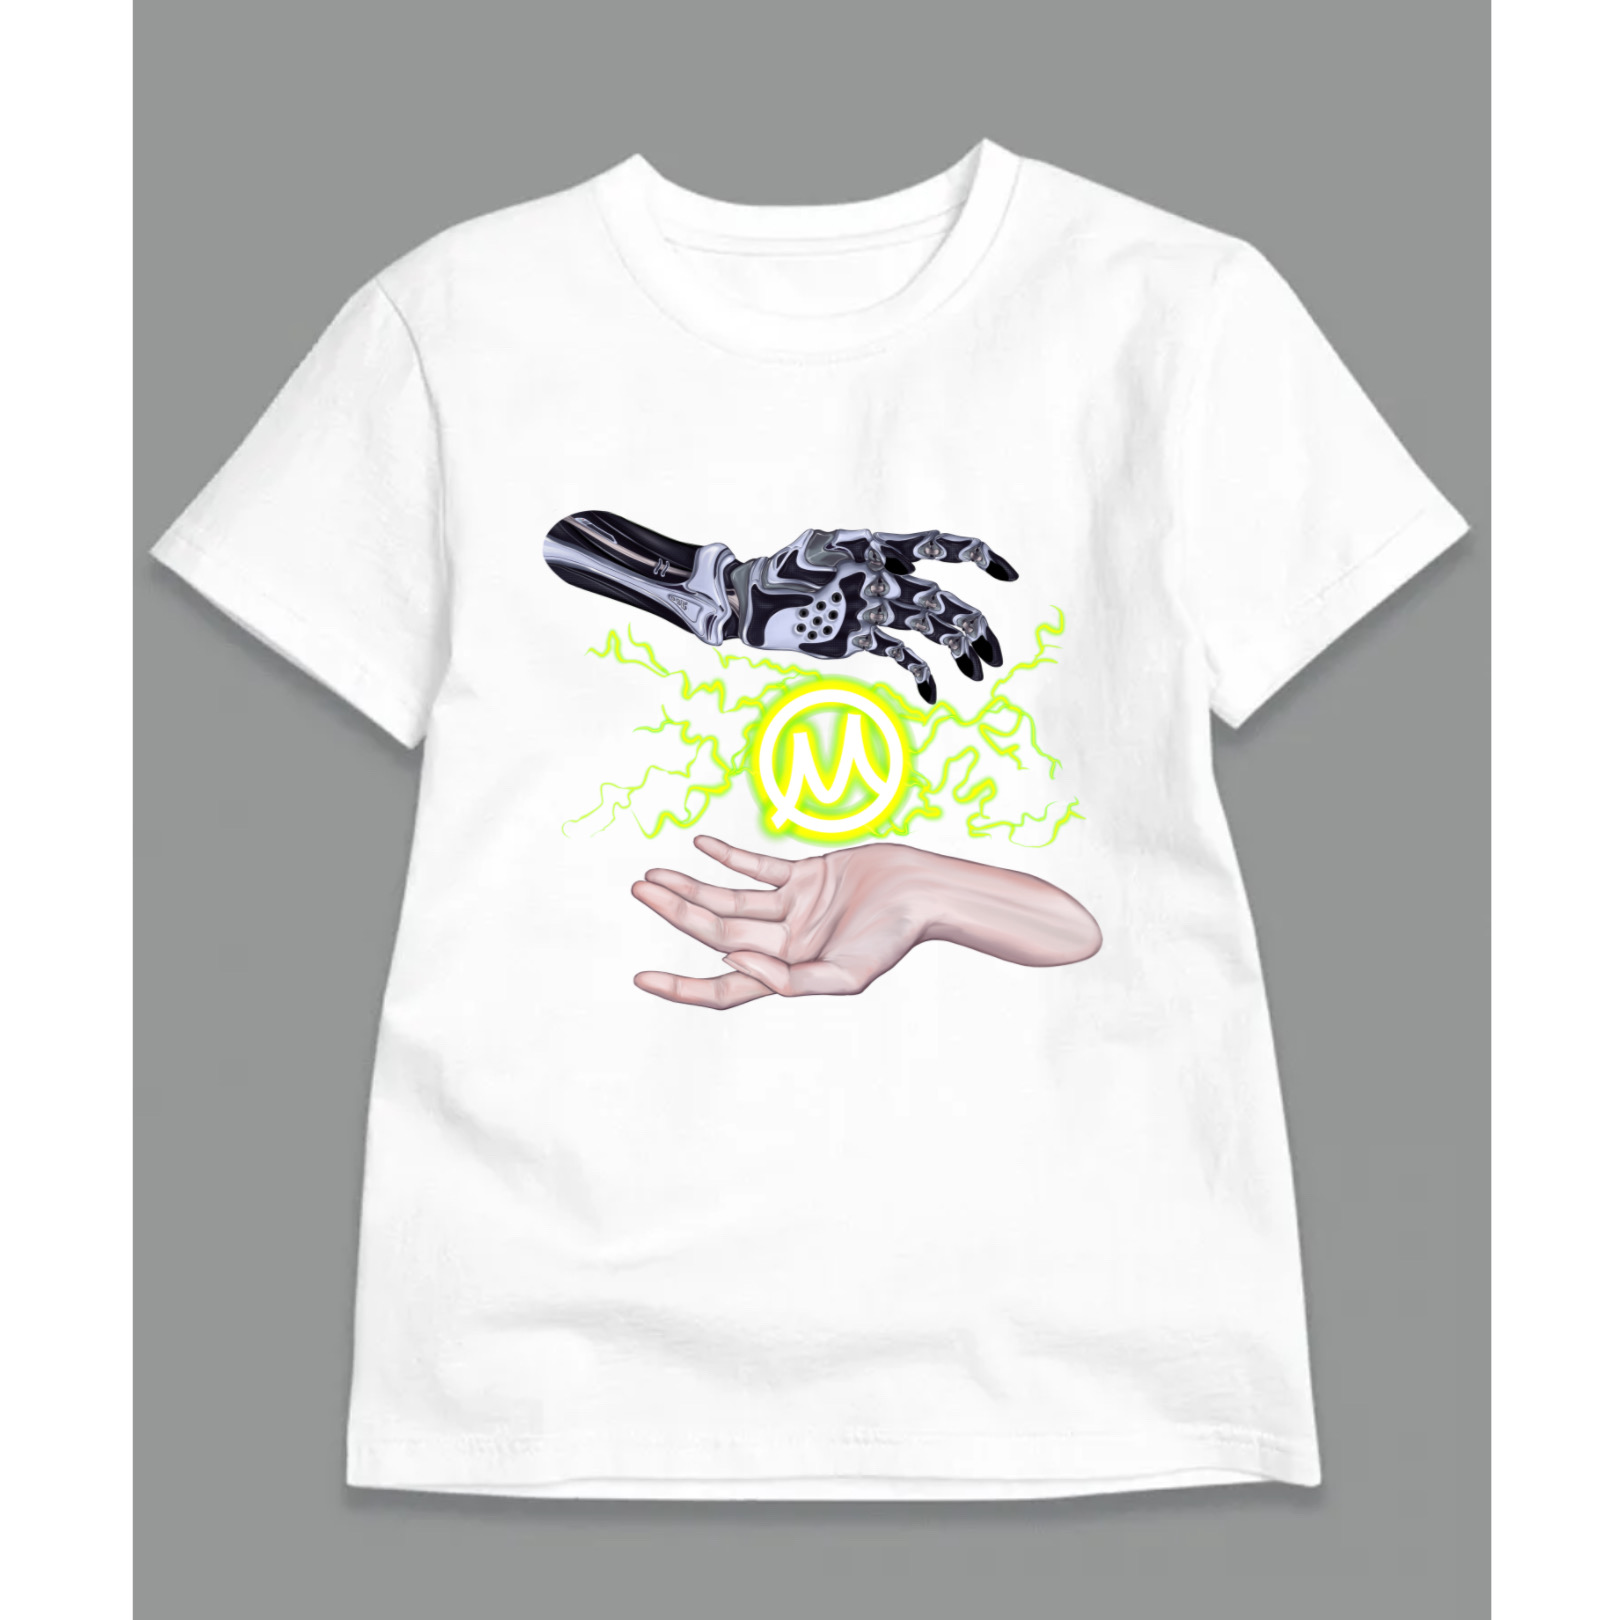 Нарисовать принты на футболки для компании Моторика фото f_311609d751b473fb.jpg